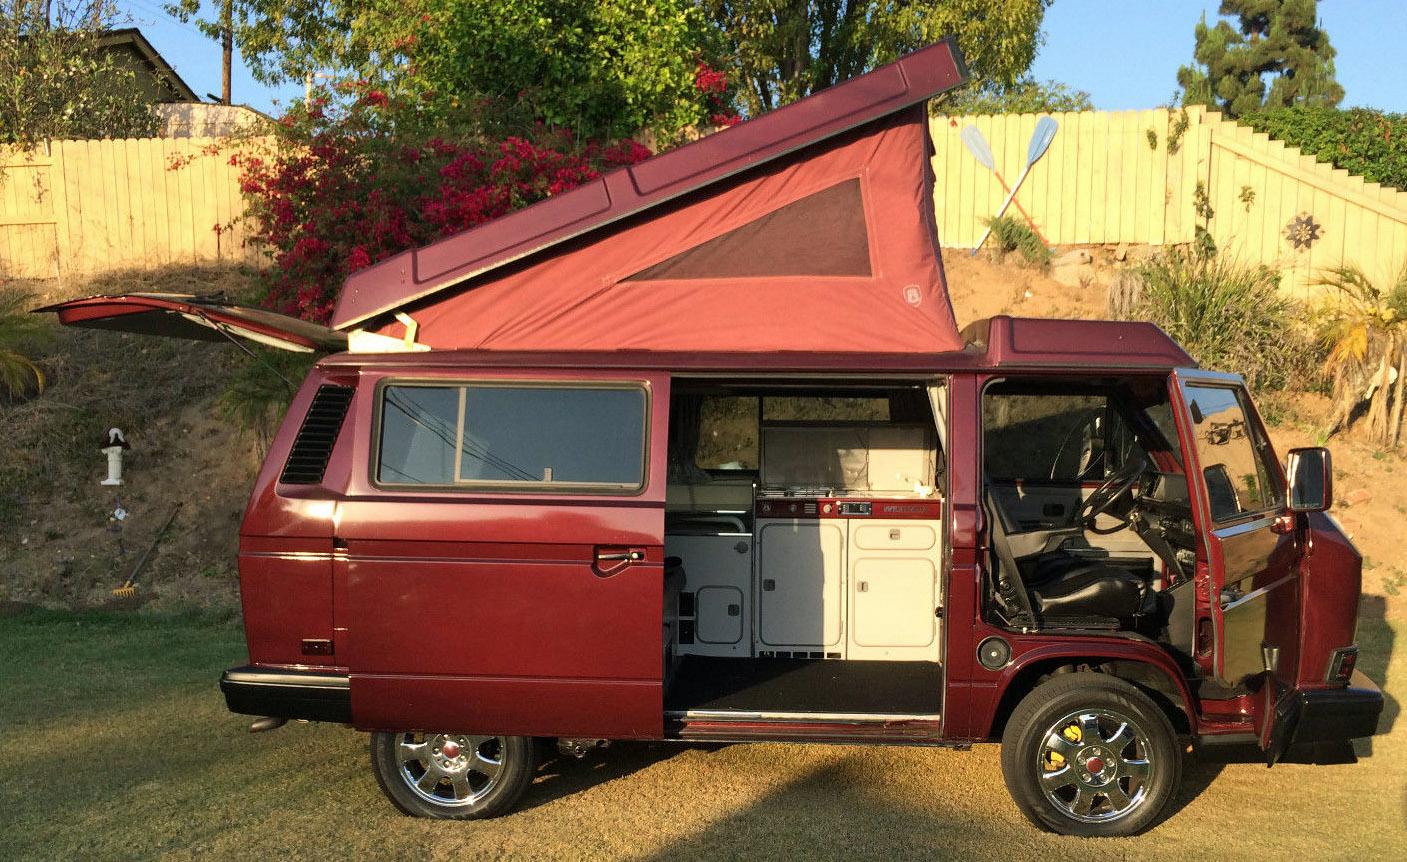 1990 VW Vanagon Westfalia Camper - Best In Show Winner - Auction